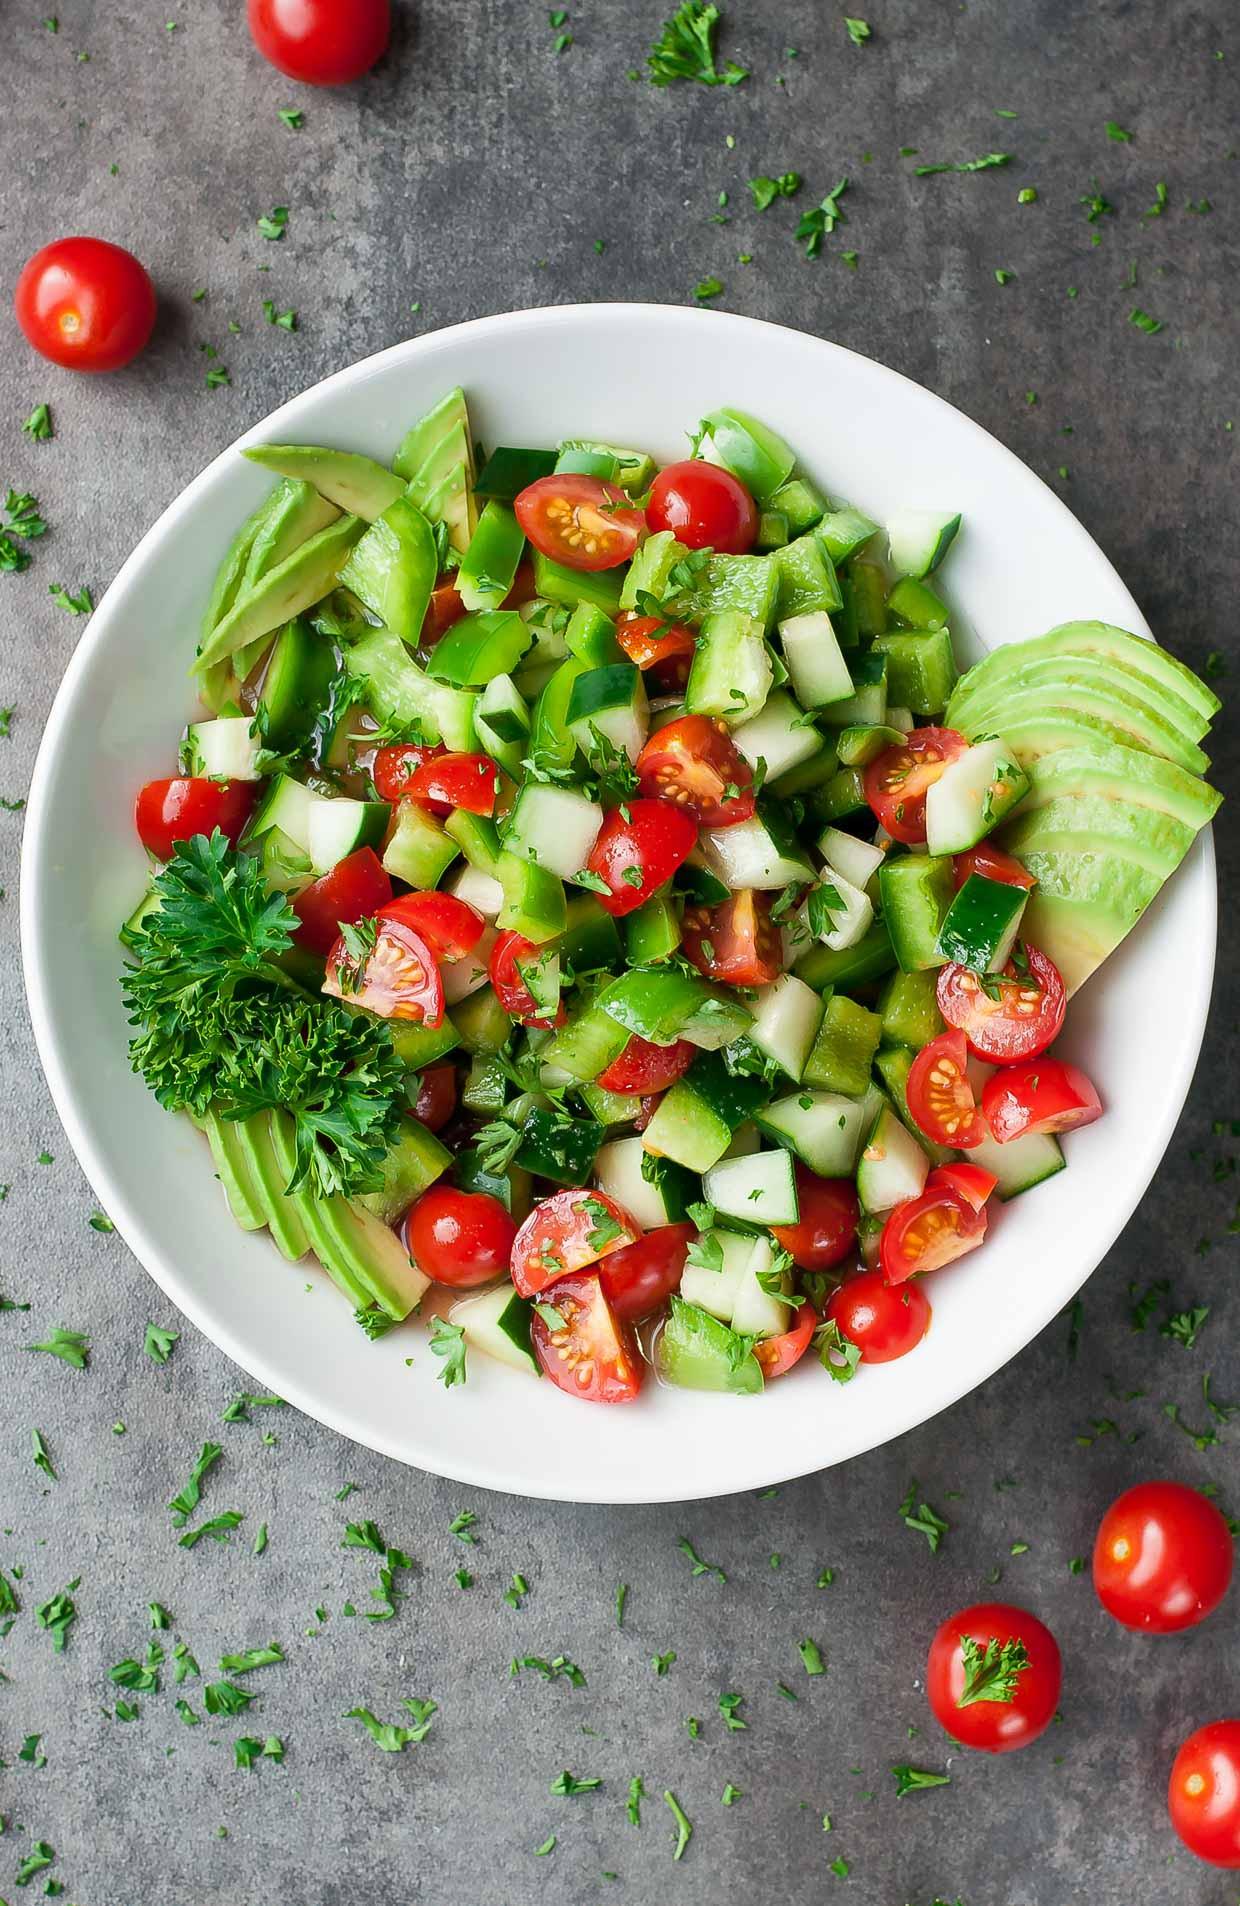 Salads Recipes Healthy  20 Easy Healthy Salad Recipes Peas and Crayons Blog